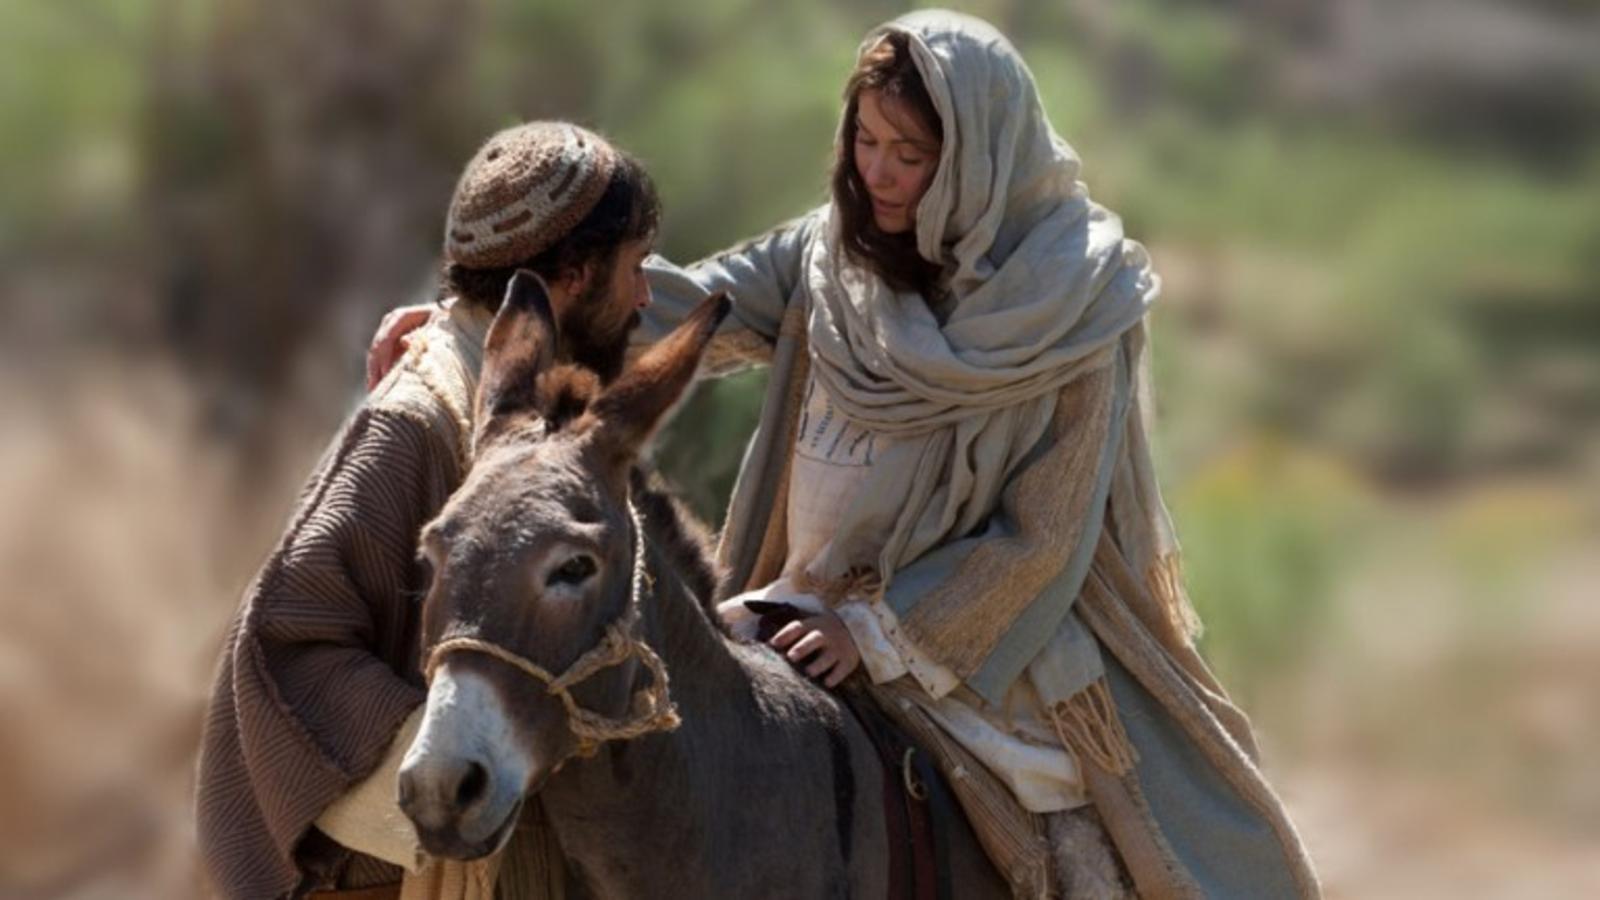 mary and joseph travel to bethlehem 2015 01 01